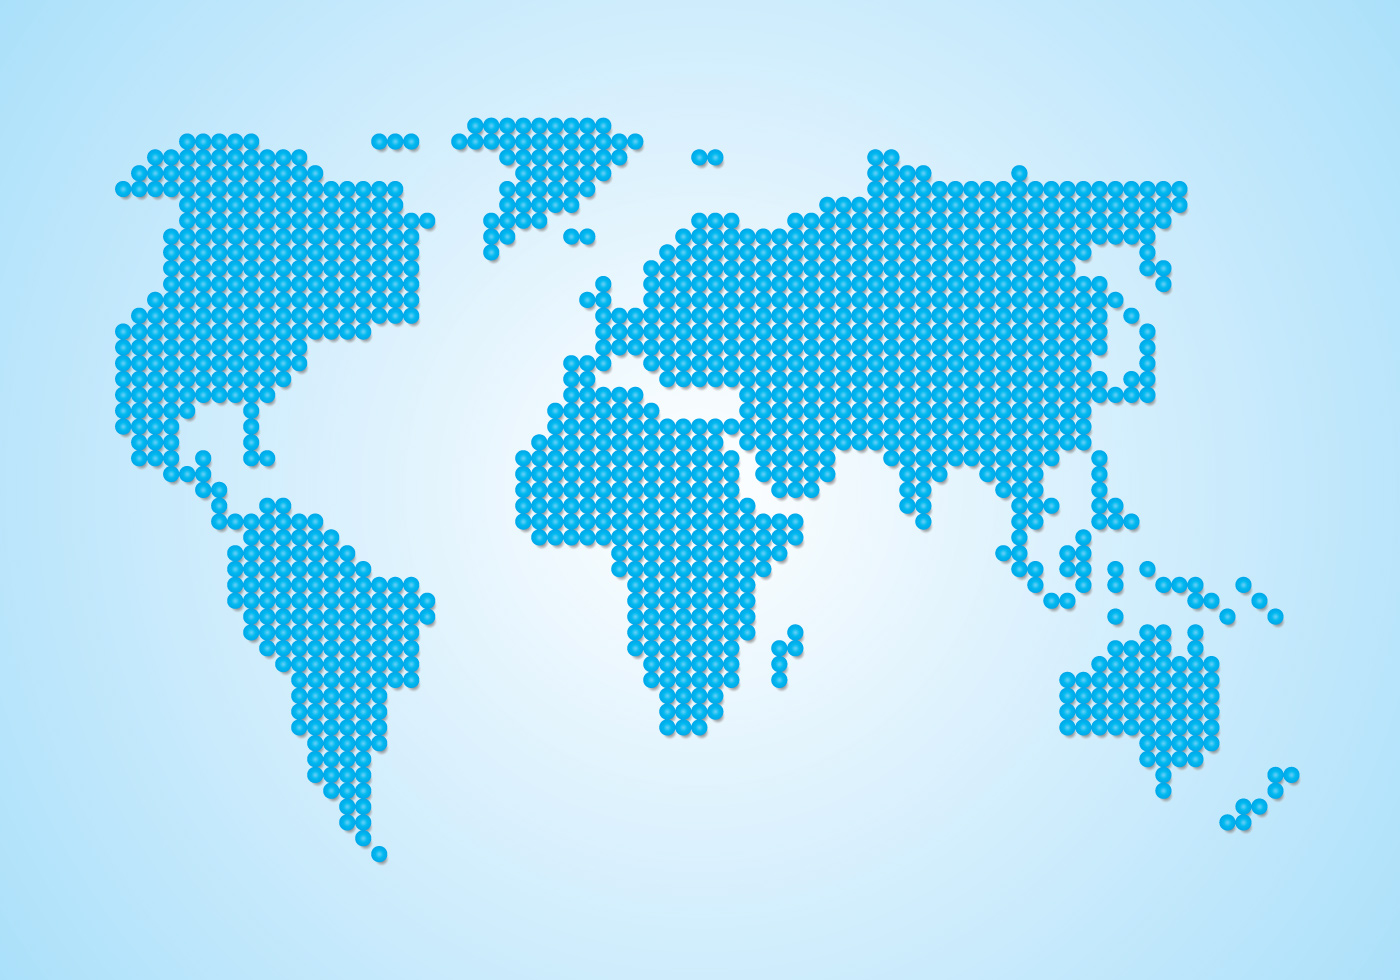 Dot World Map.Europe Map Dots Free Vector Art 11325 Free Downloads